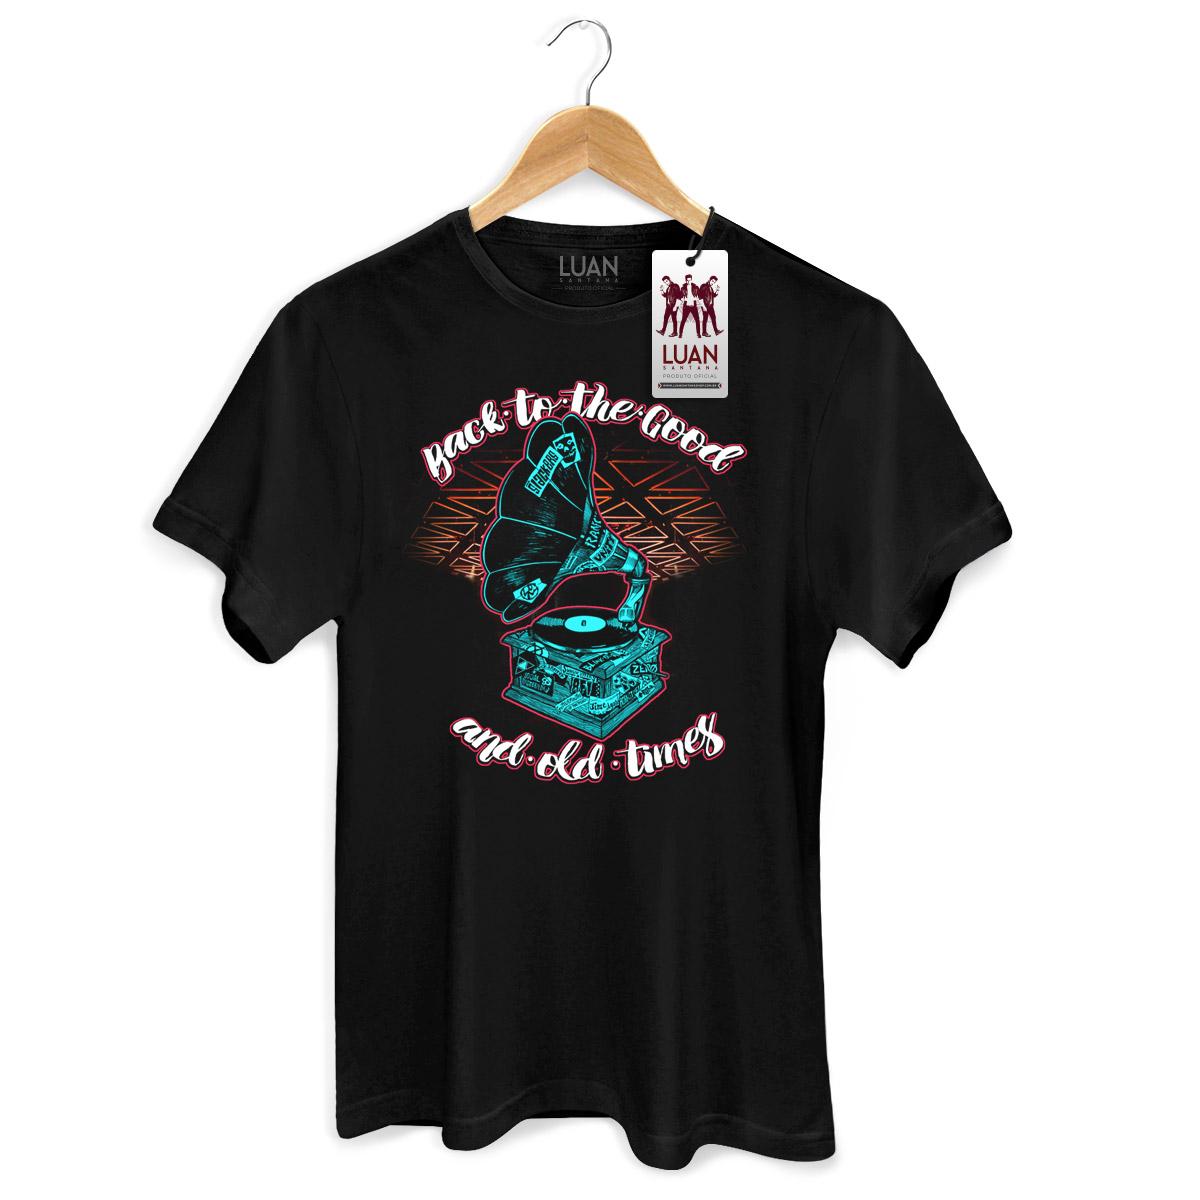 Camiseta Masculina Luan Santana Back To The Good And Old Times